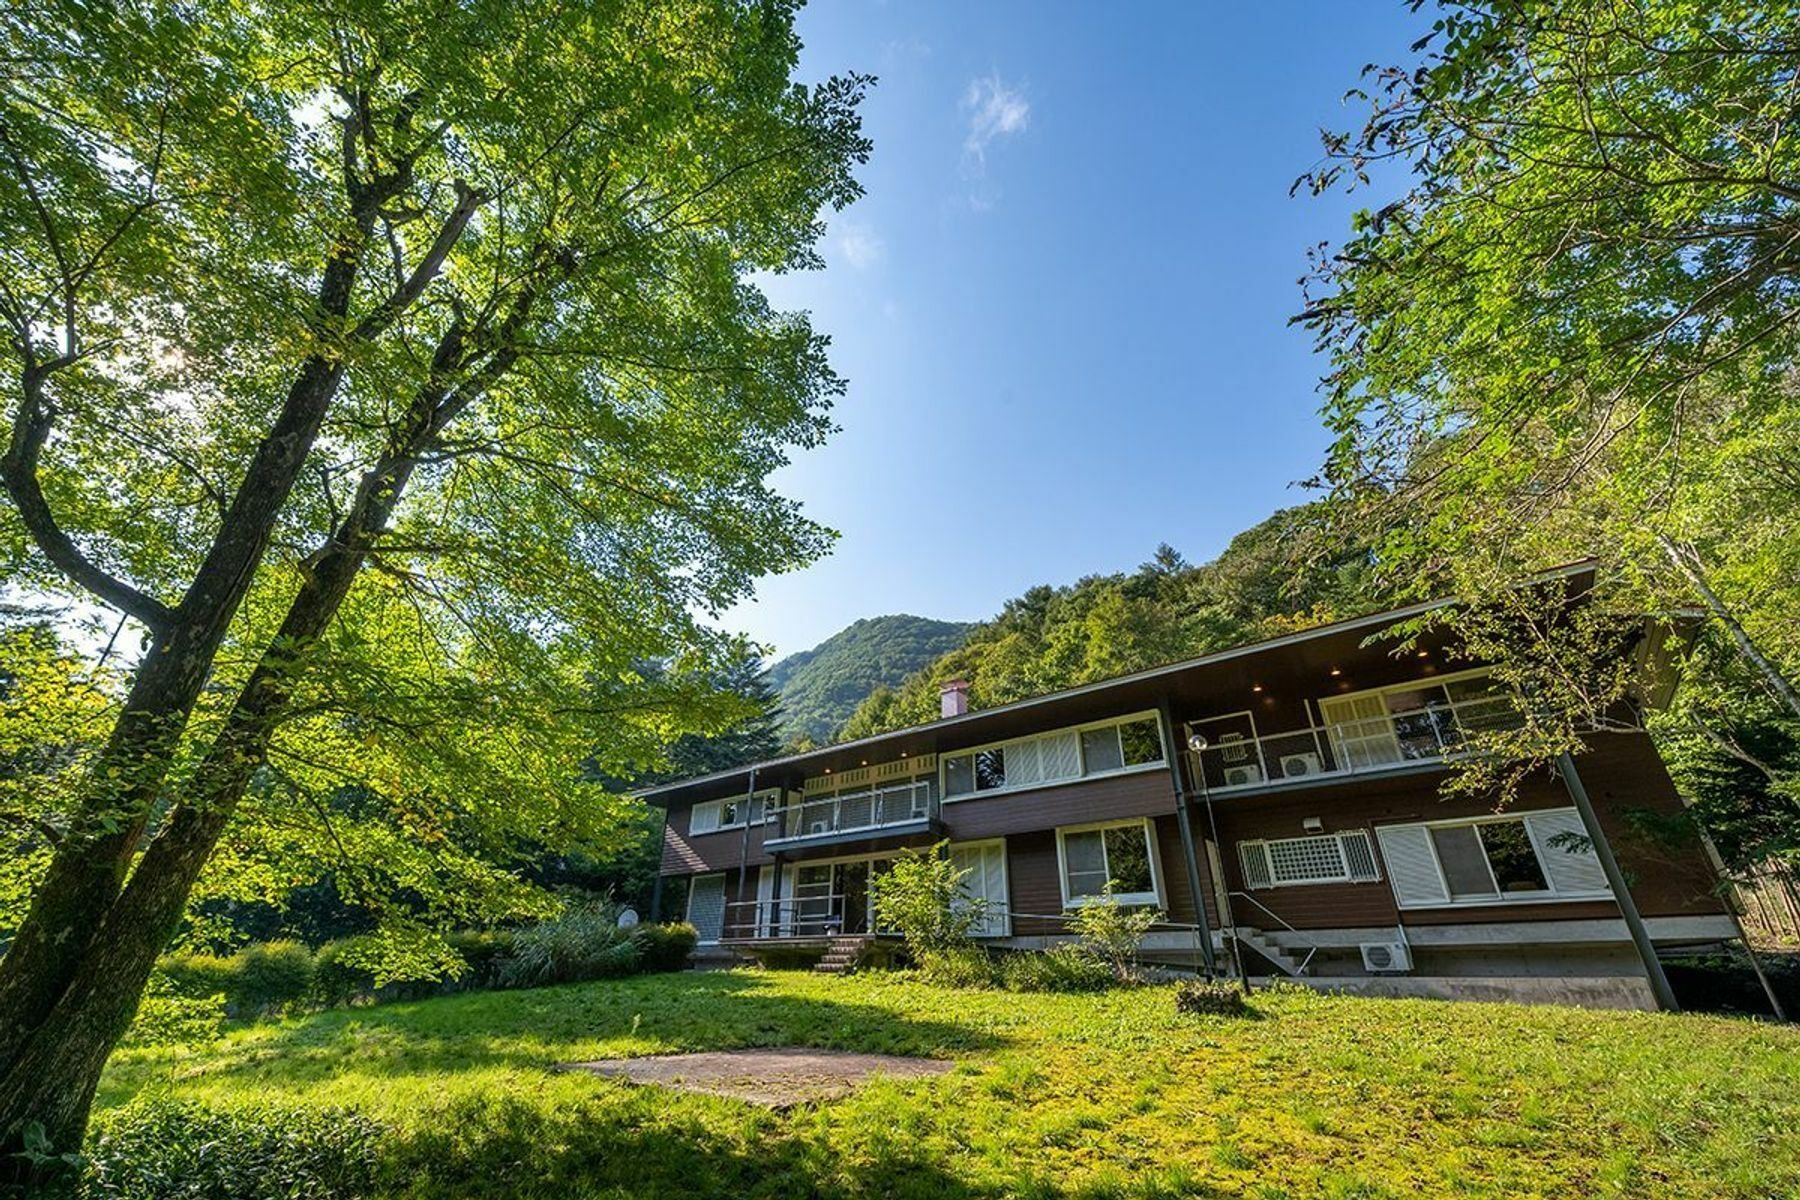 House in Nagakura, Nagano, Japan 1